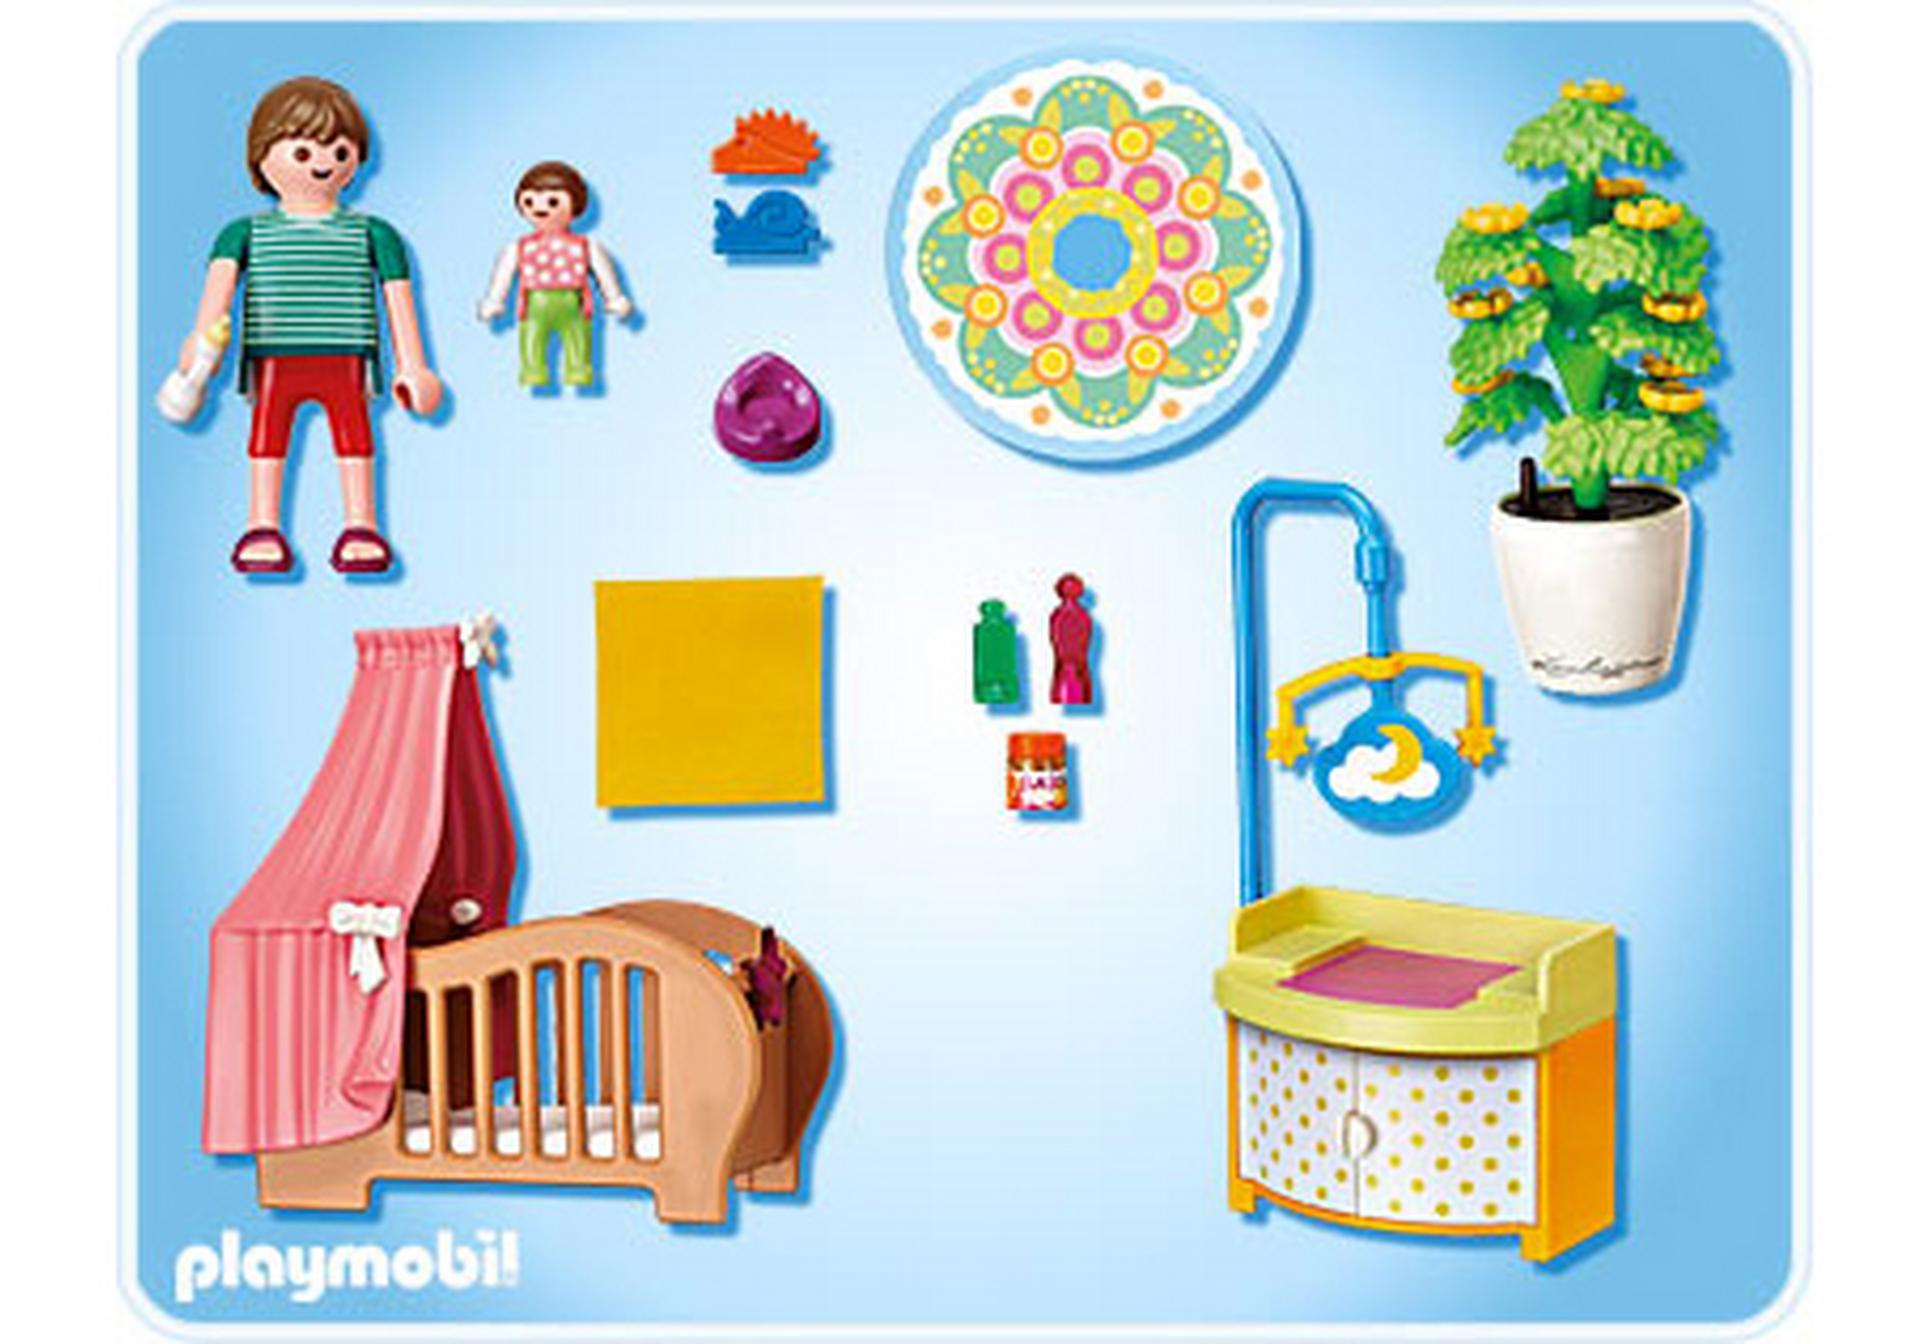 Chambre de b b avec berceau 5334 a playmobil france for Playmobil chambre enfant